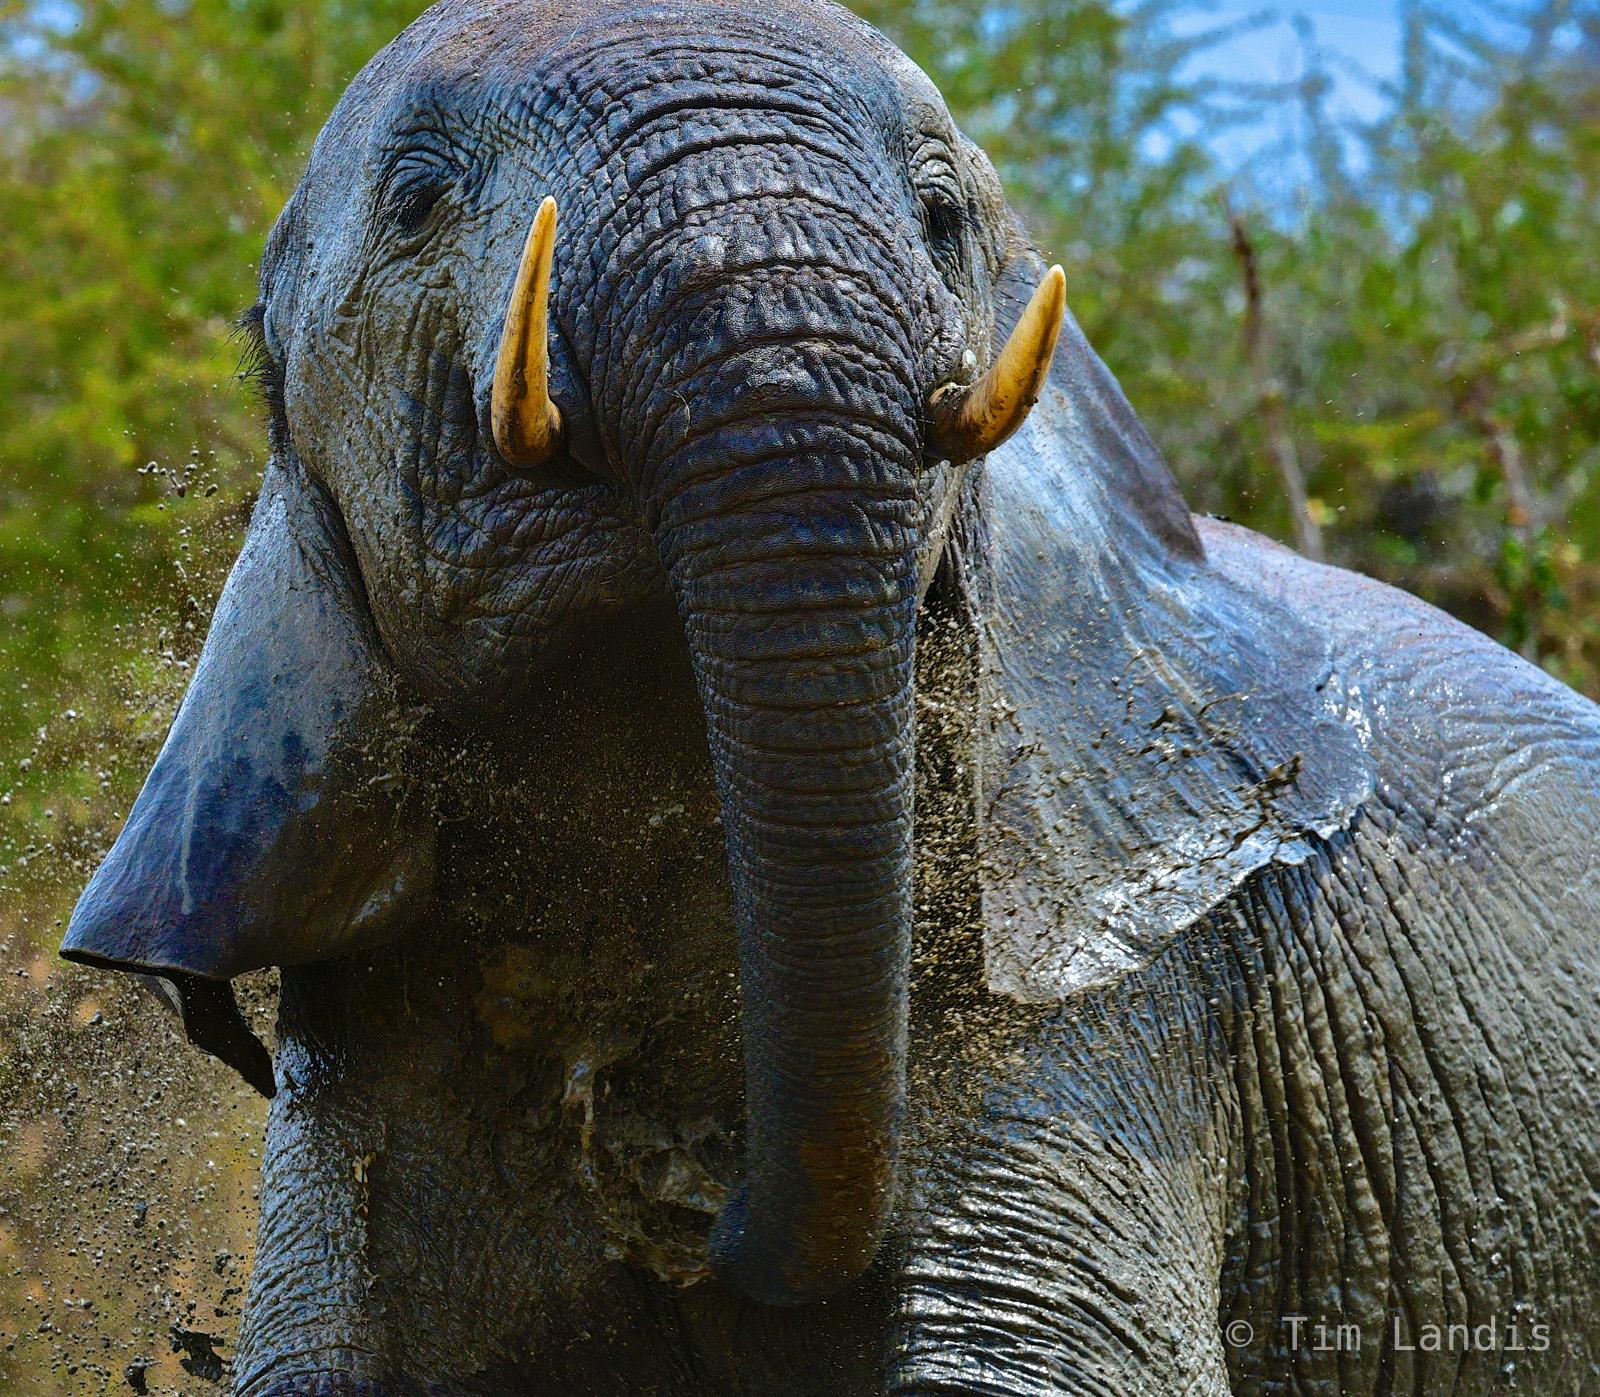 Elephant in his mudhole, happy elephant, pure bliss, photo